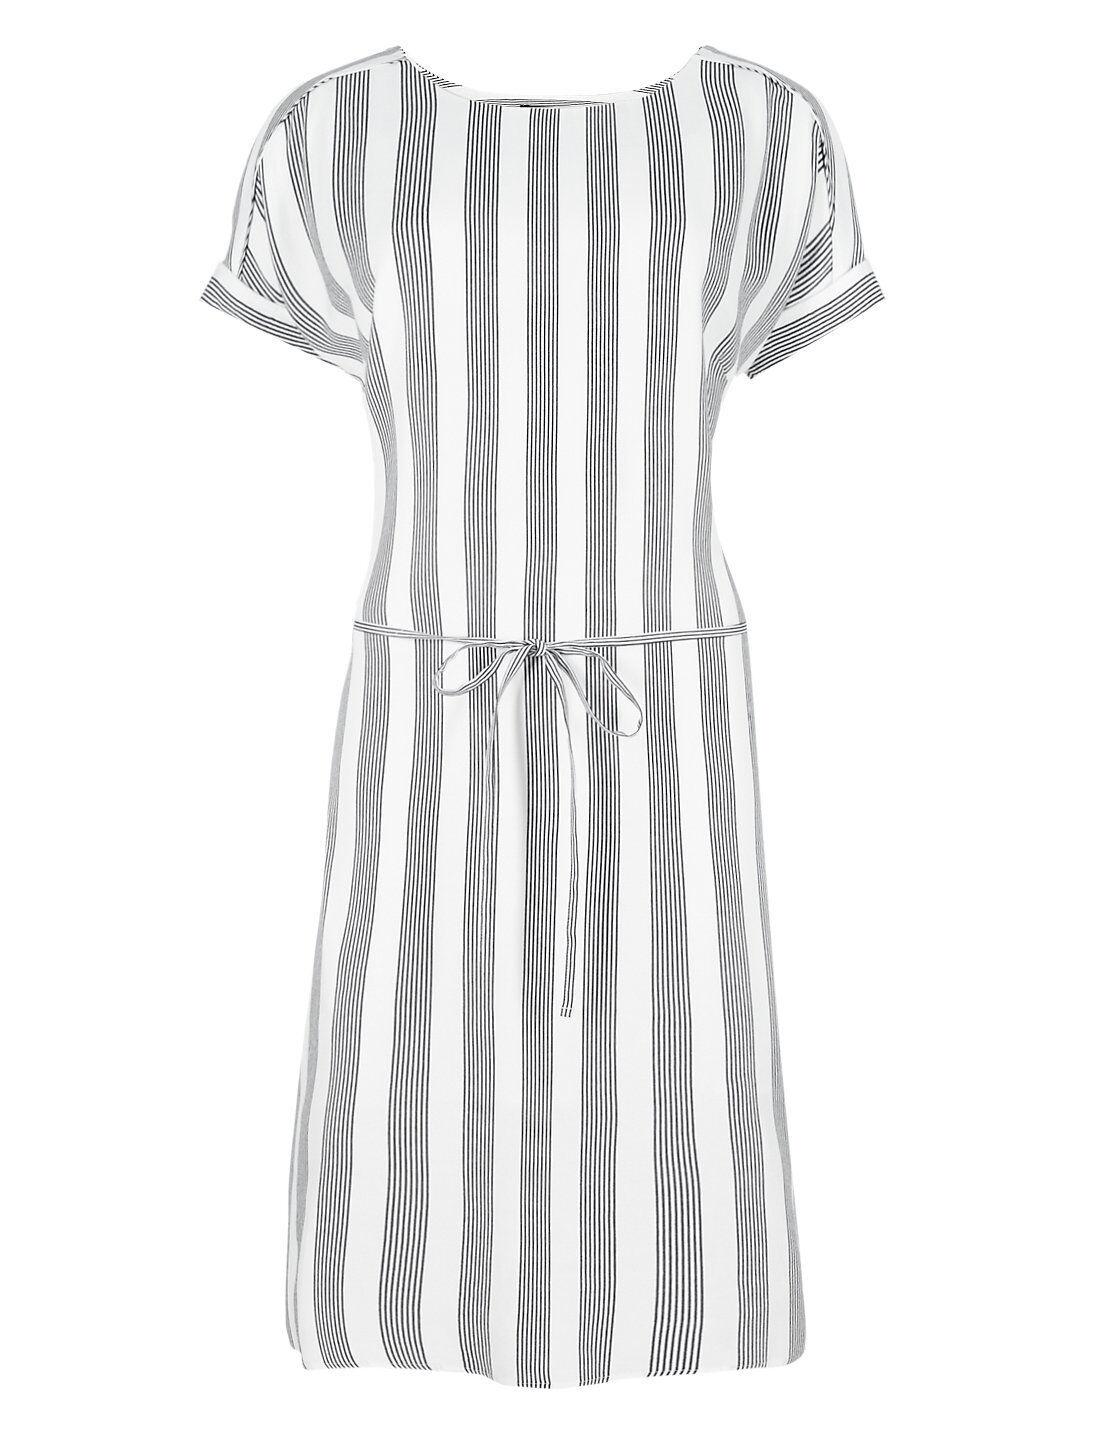 M & S AUTOGRAPH LADIES blueE & WHITE STRIPED WOVEN SHIFT DRESS